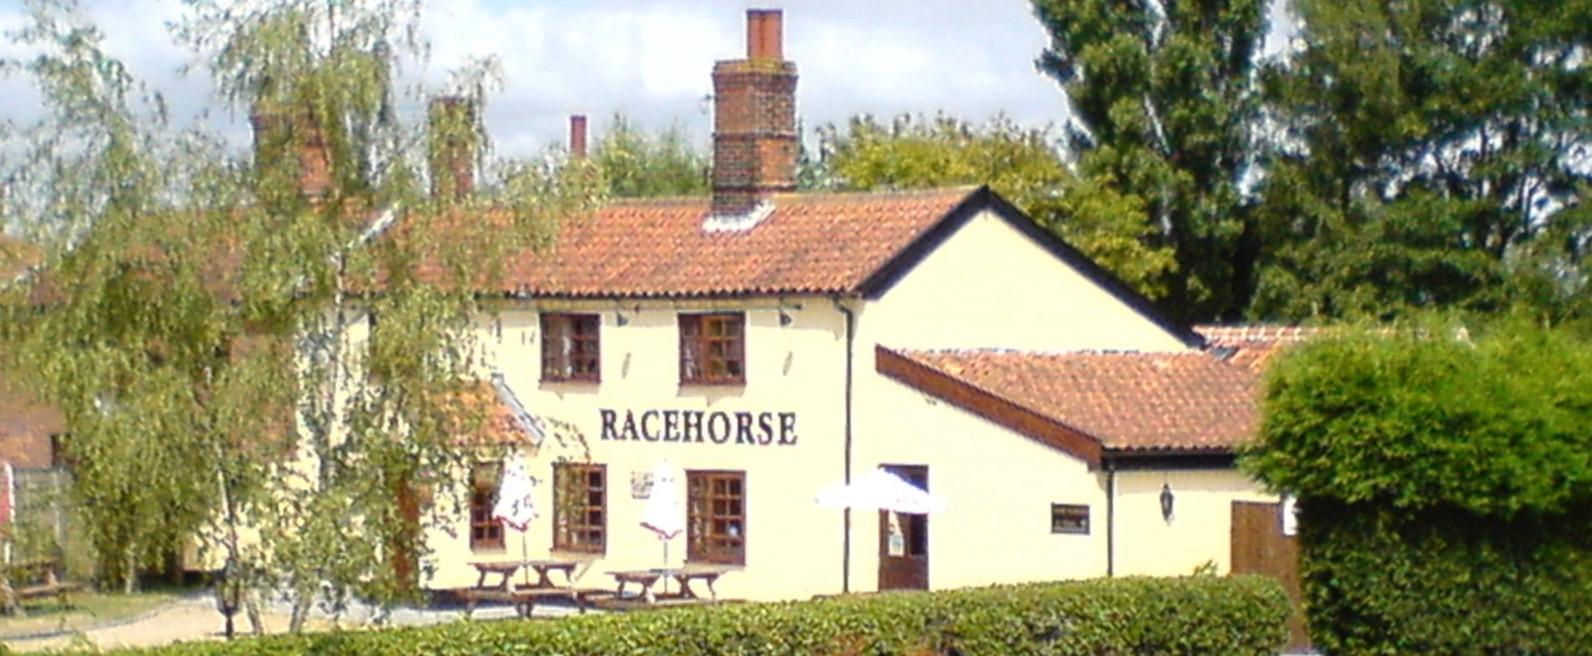 Racehorse06.jpg